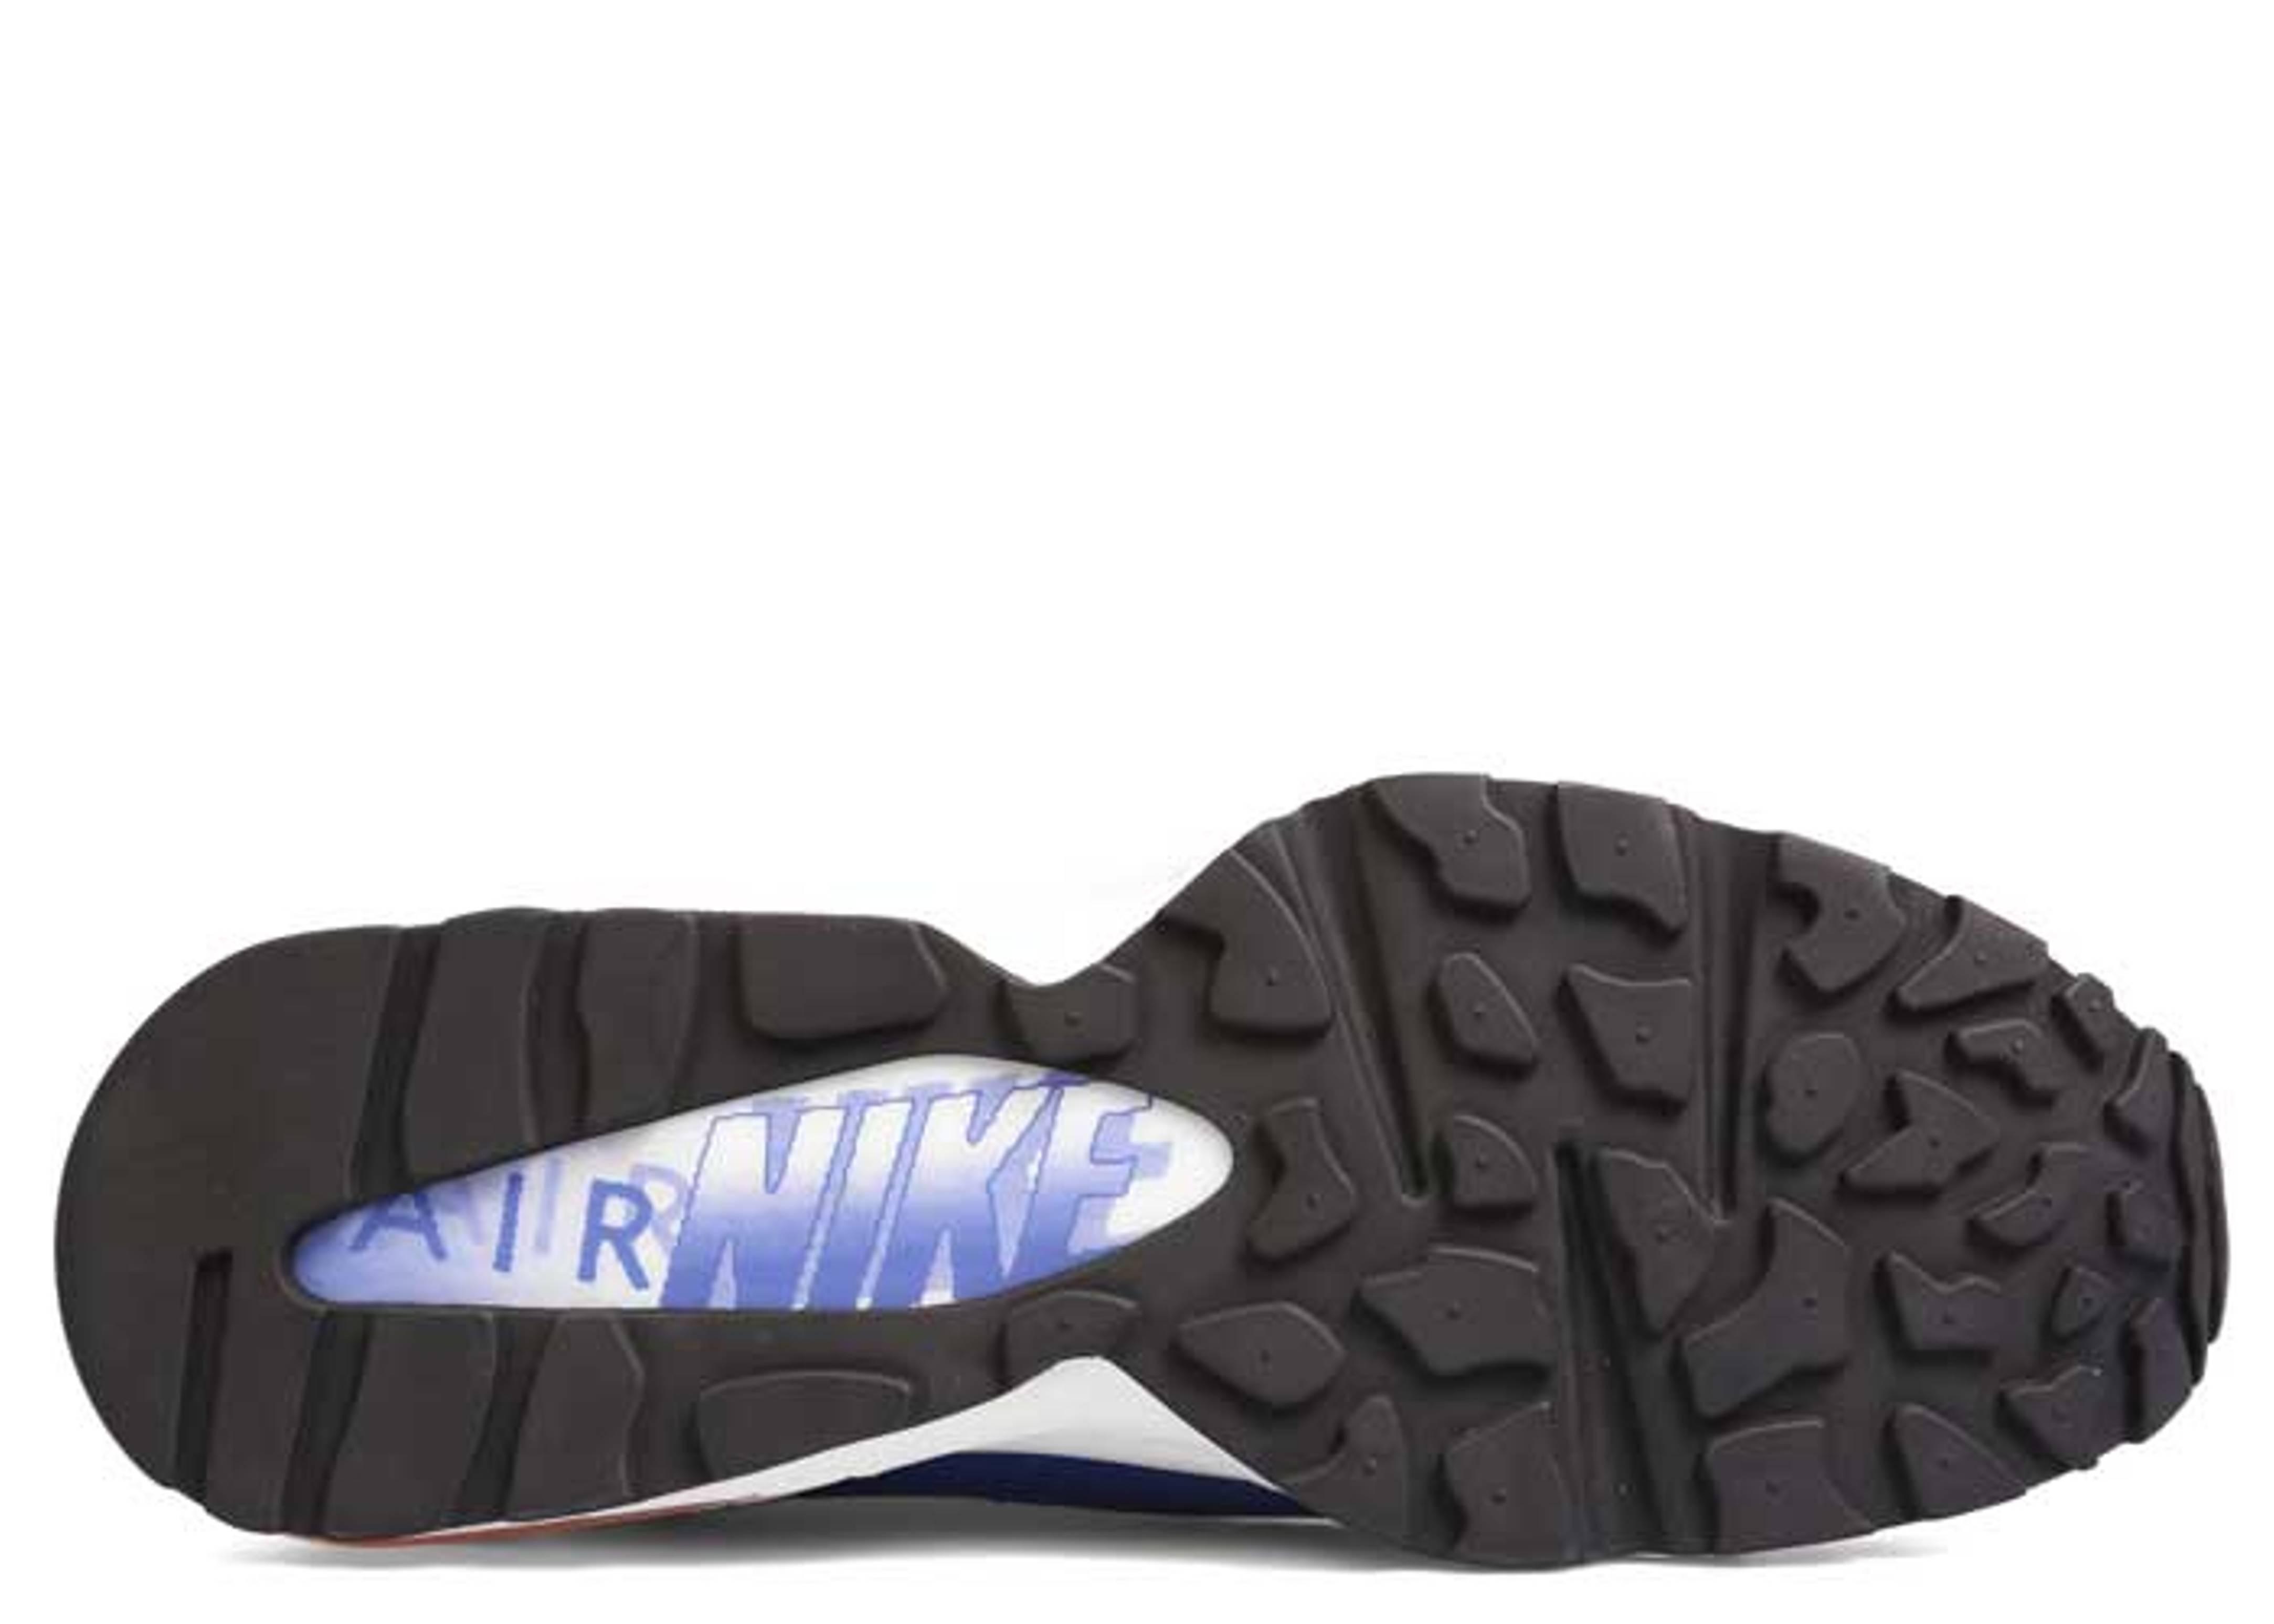 timeless design dca1b 14175 Air Max 93 - Nike - 306551 100 - white bright citrus hyper blue black    Flight Club